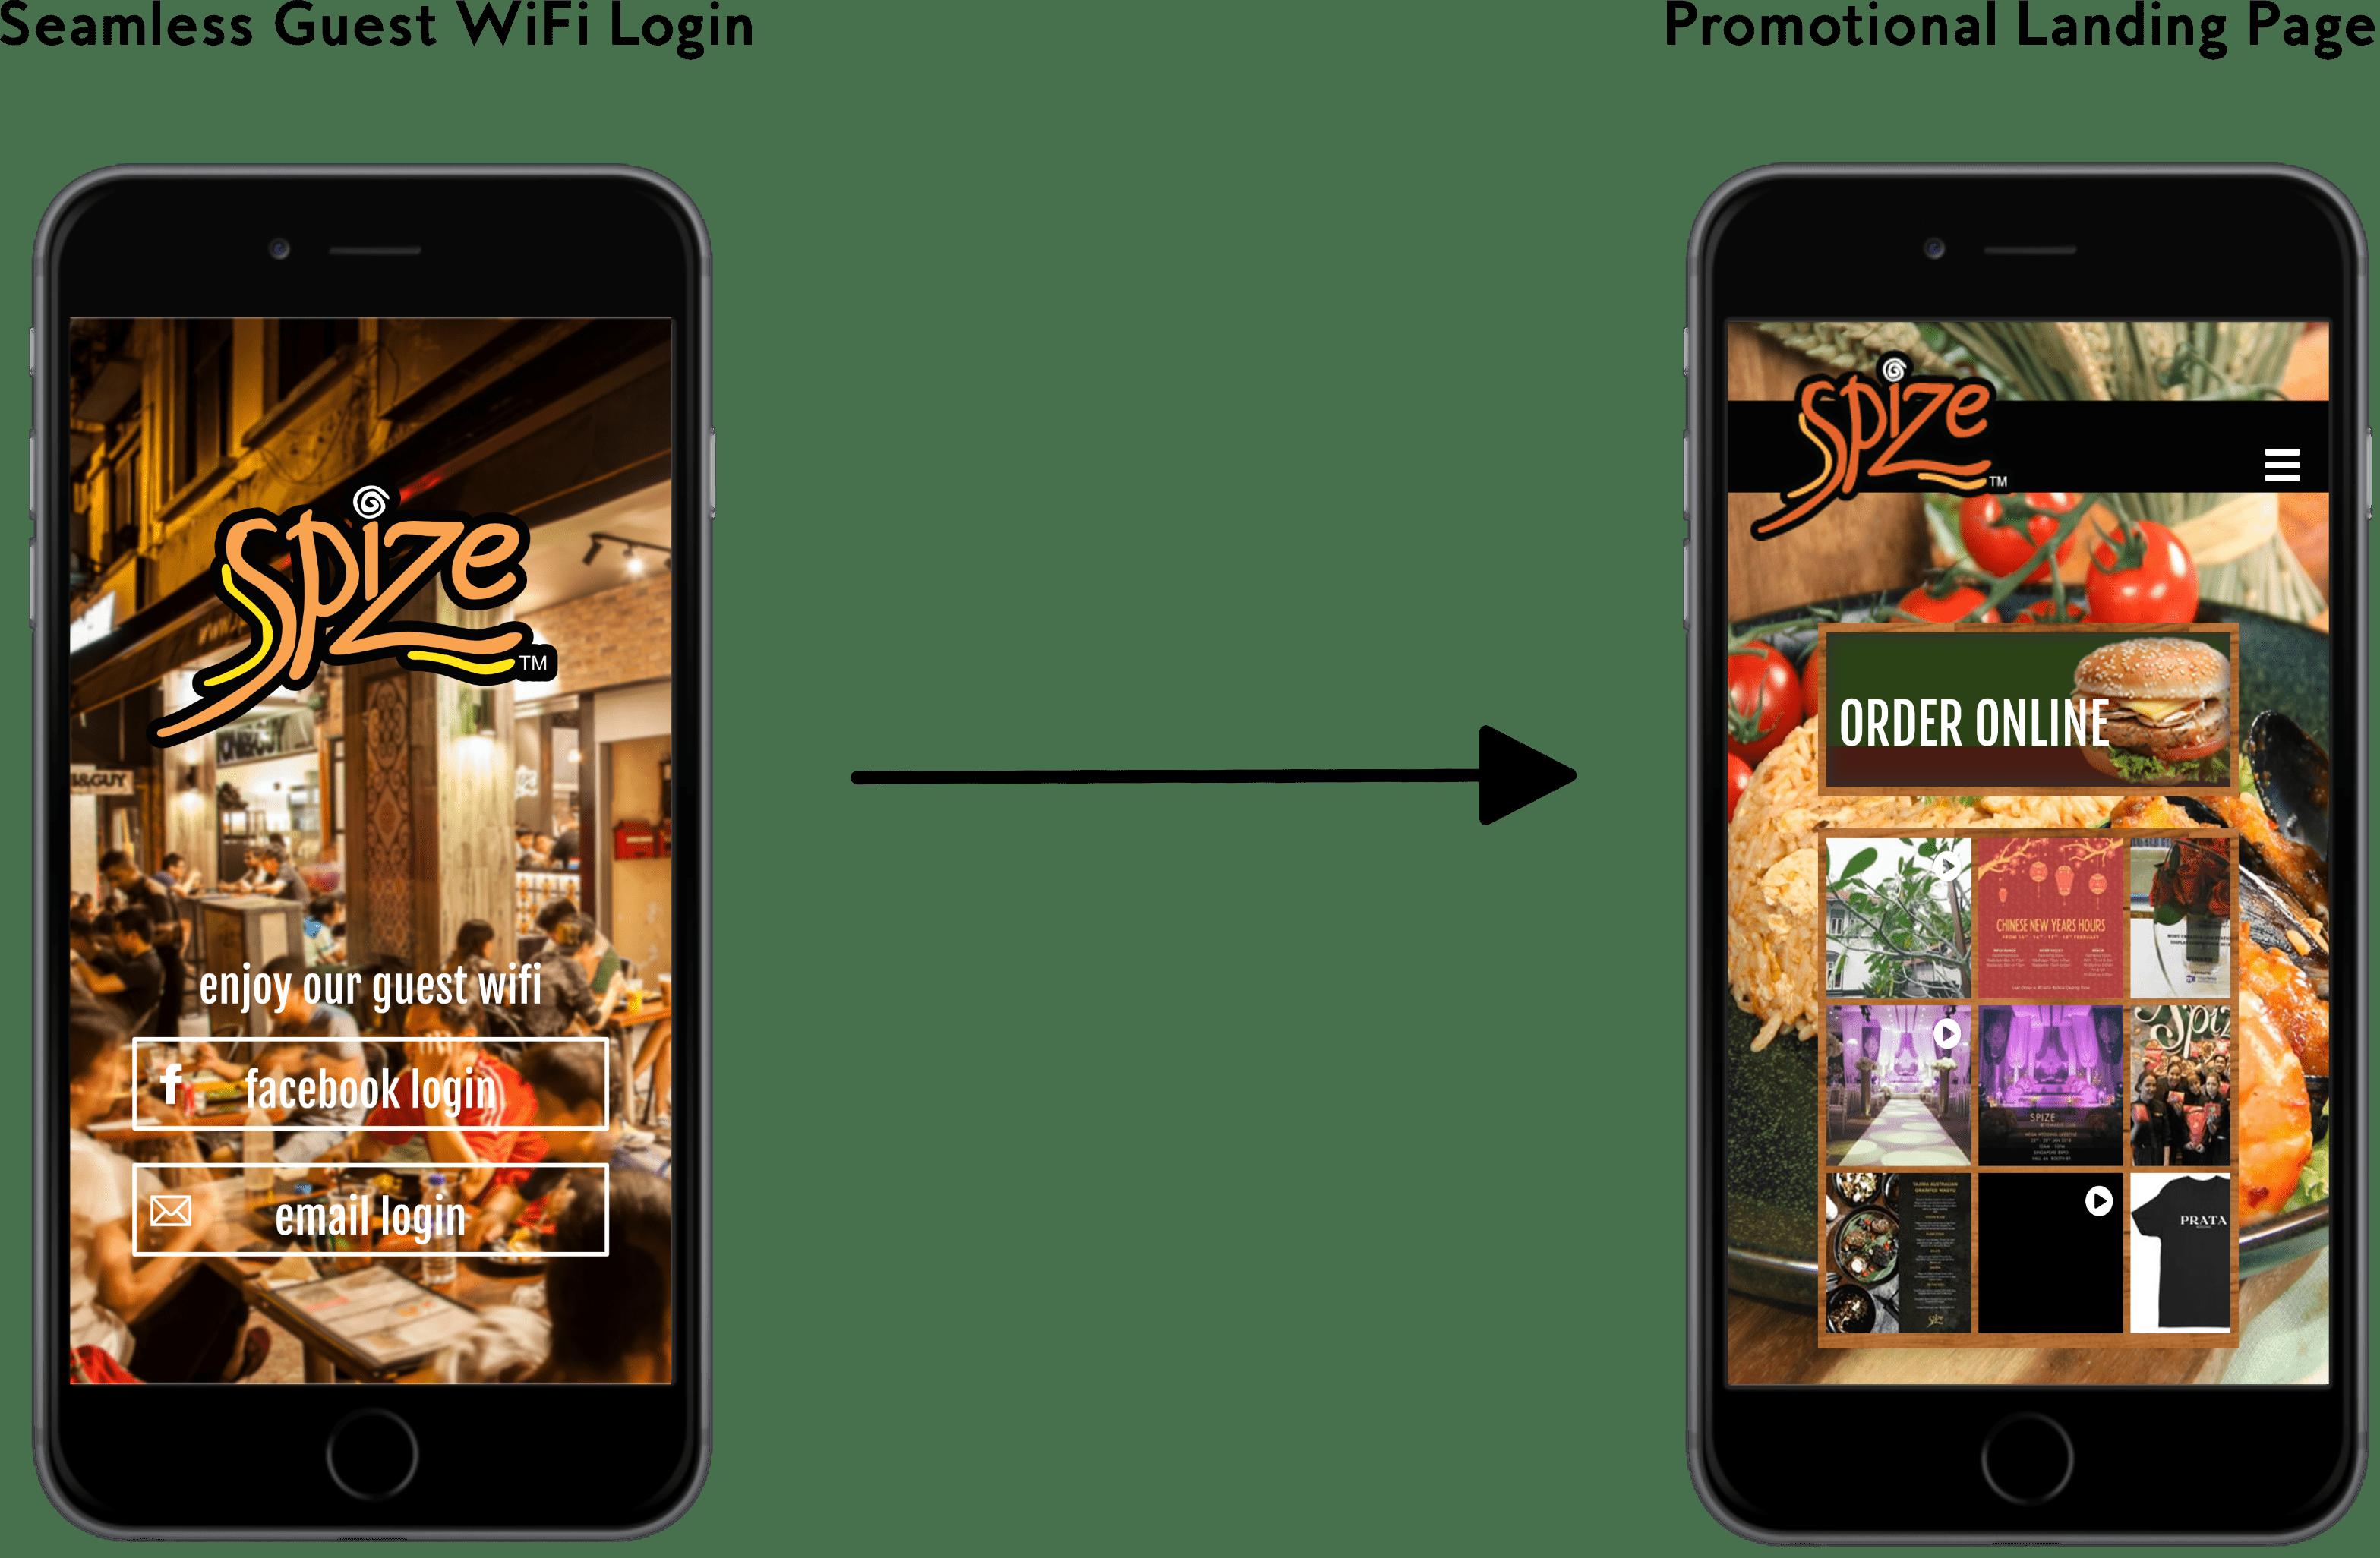 SPIZE Implements Social WiFi Across Restaurant Outlets